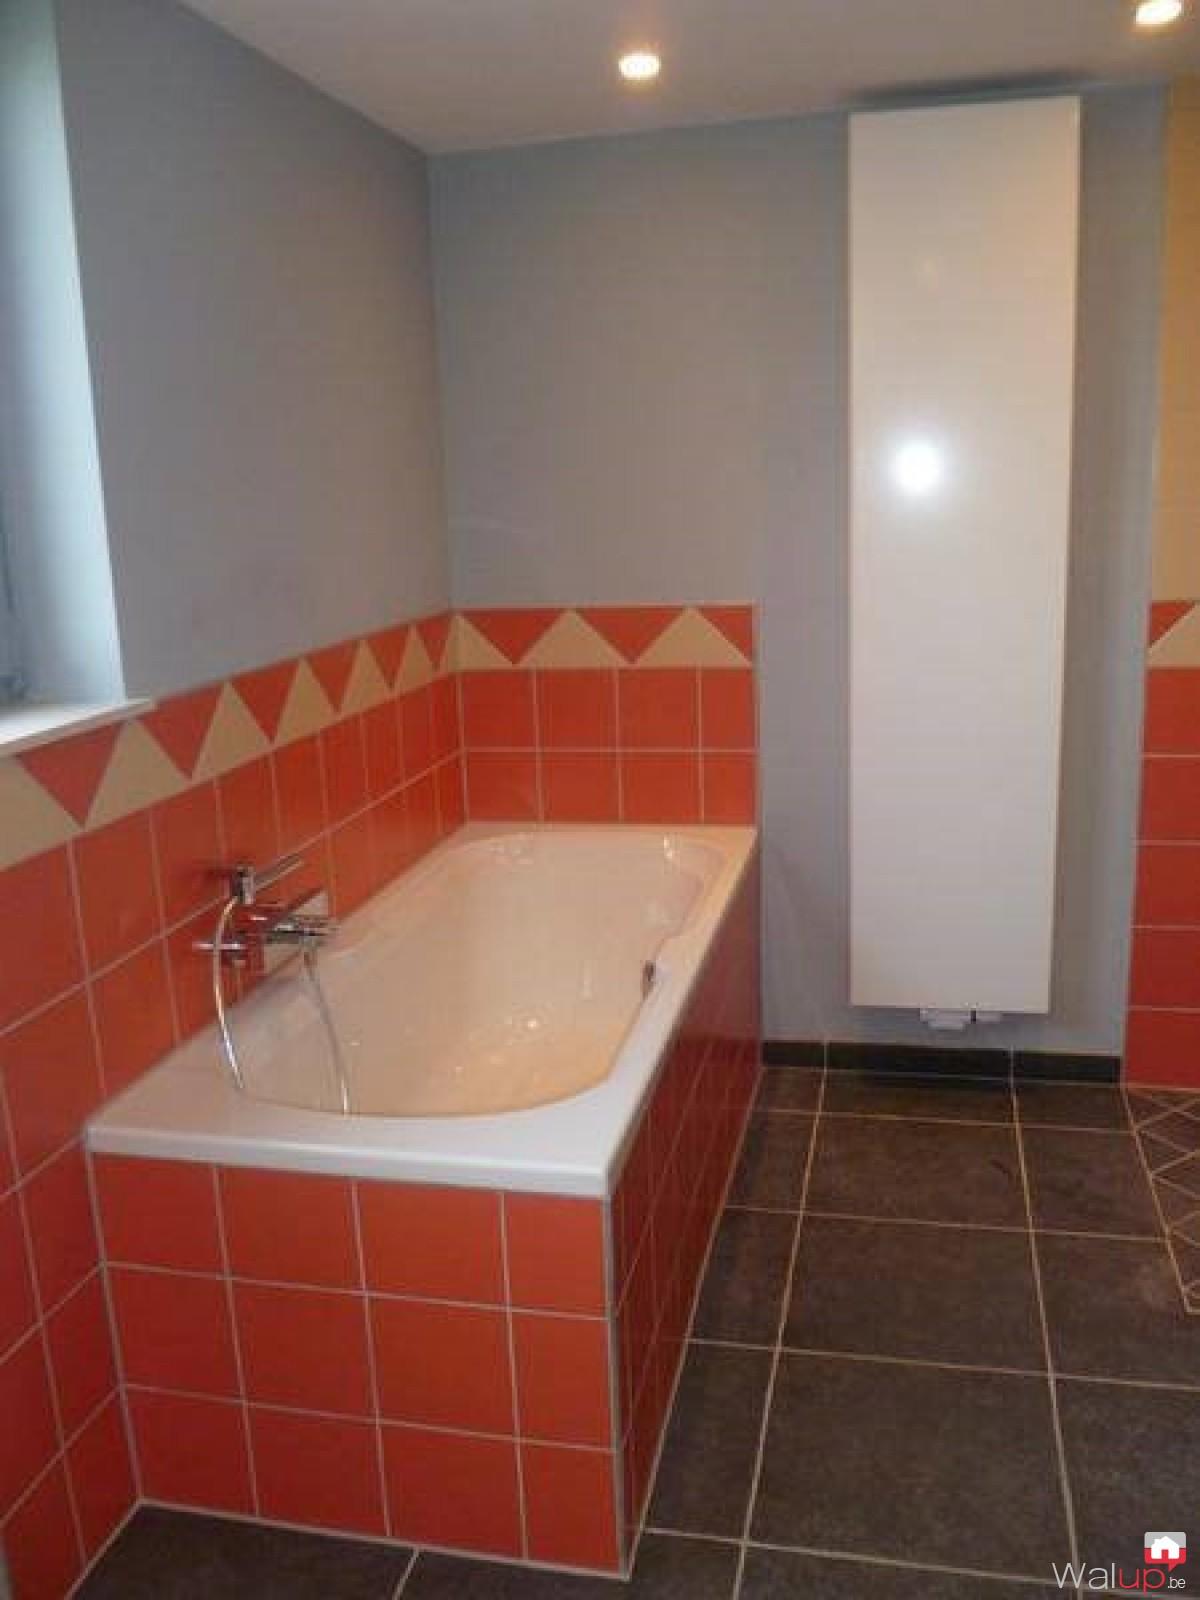 Salle de bain par nico chauffage for Chauffage salle de bain